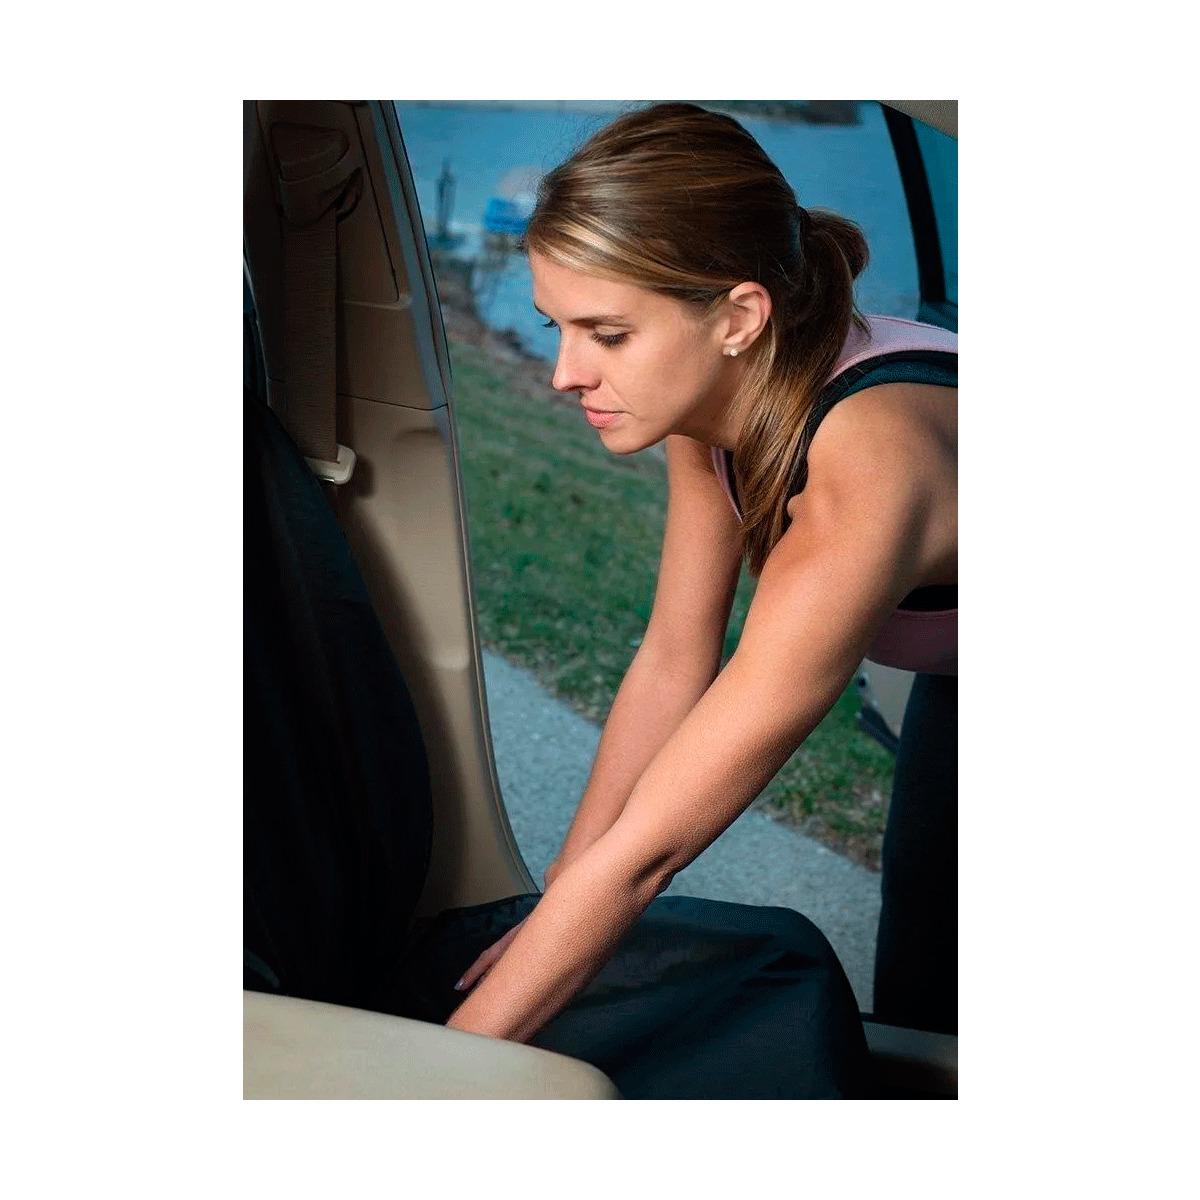 Tapete Em Vinil Volkswagen Saveiro G6 Simples + Capa Banco Protecao Banco Areia Suor Academia